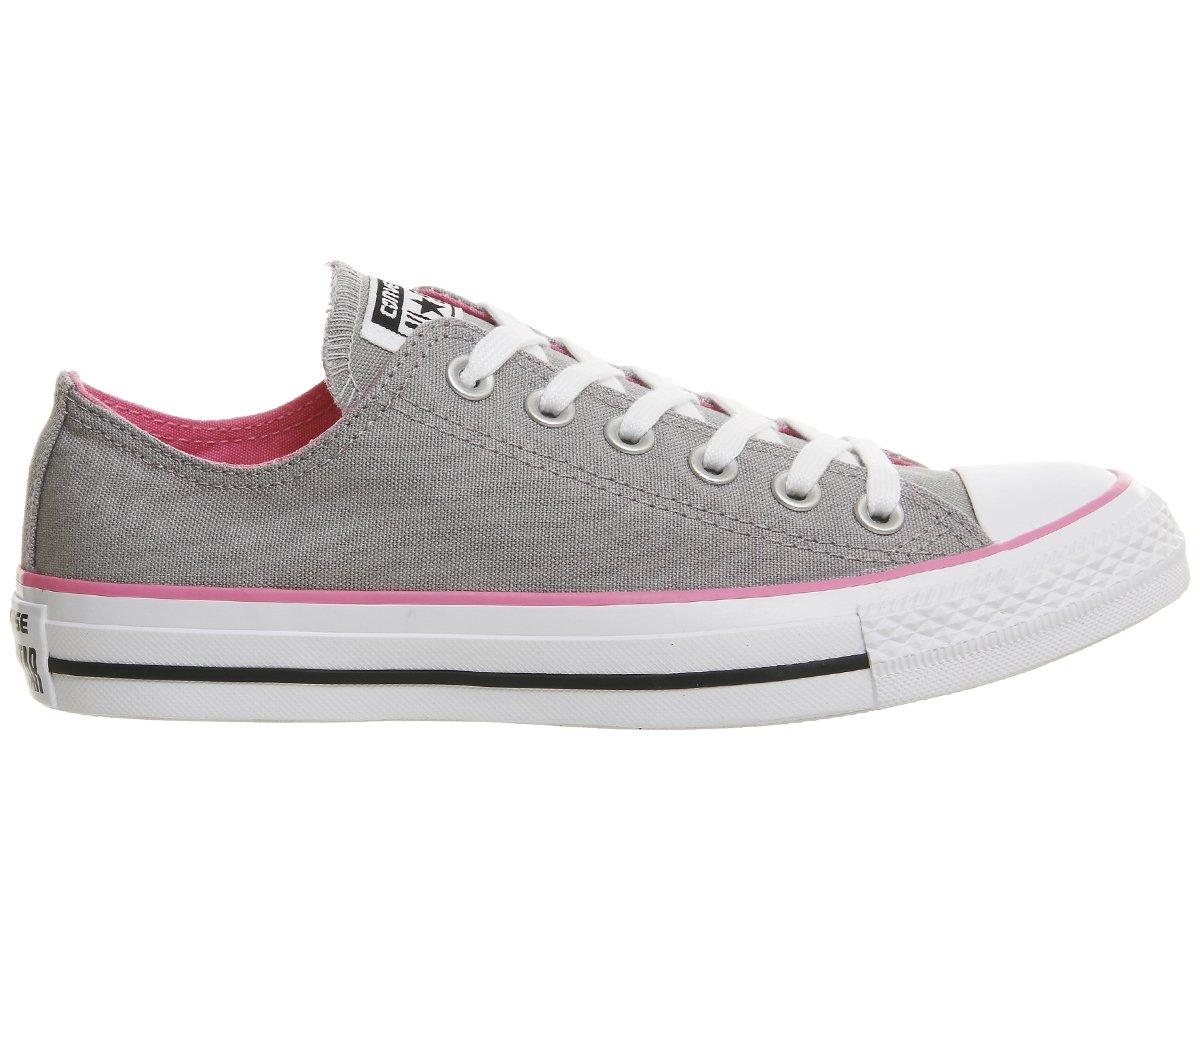 Converse Unisex-Erwachsene CTAS Seasonal-OX-White Monochrome Sneaker  5 UK|Grau/Rosa